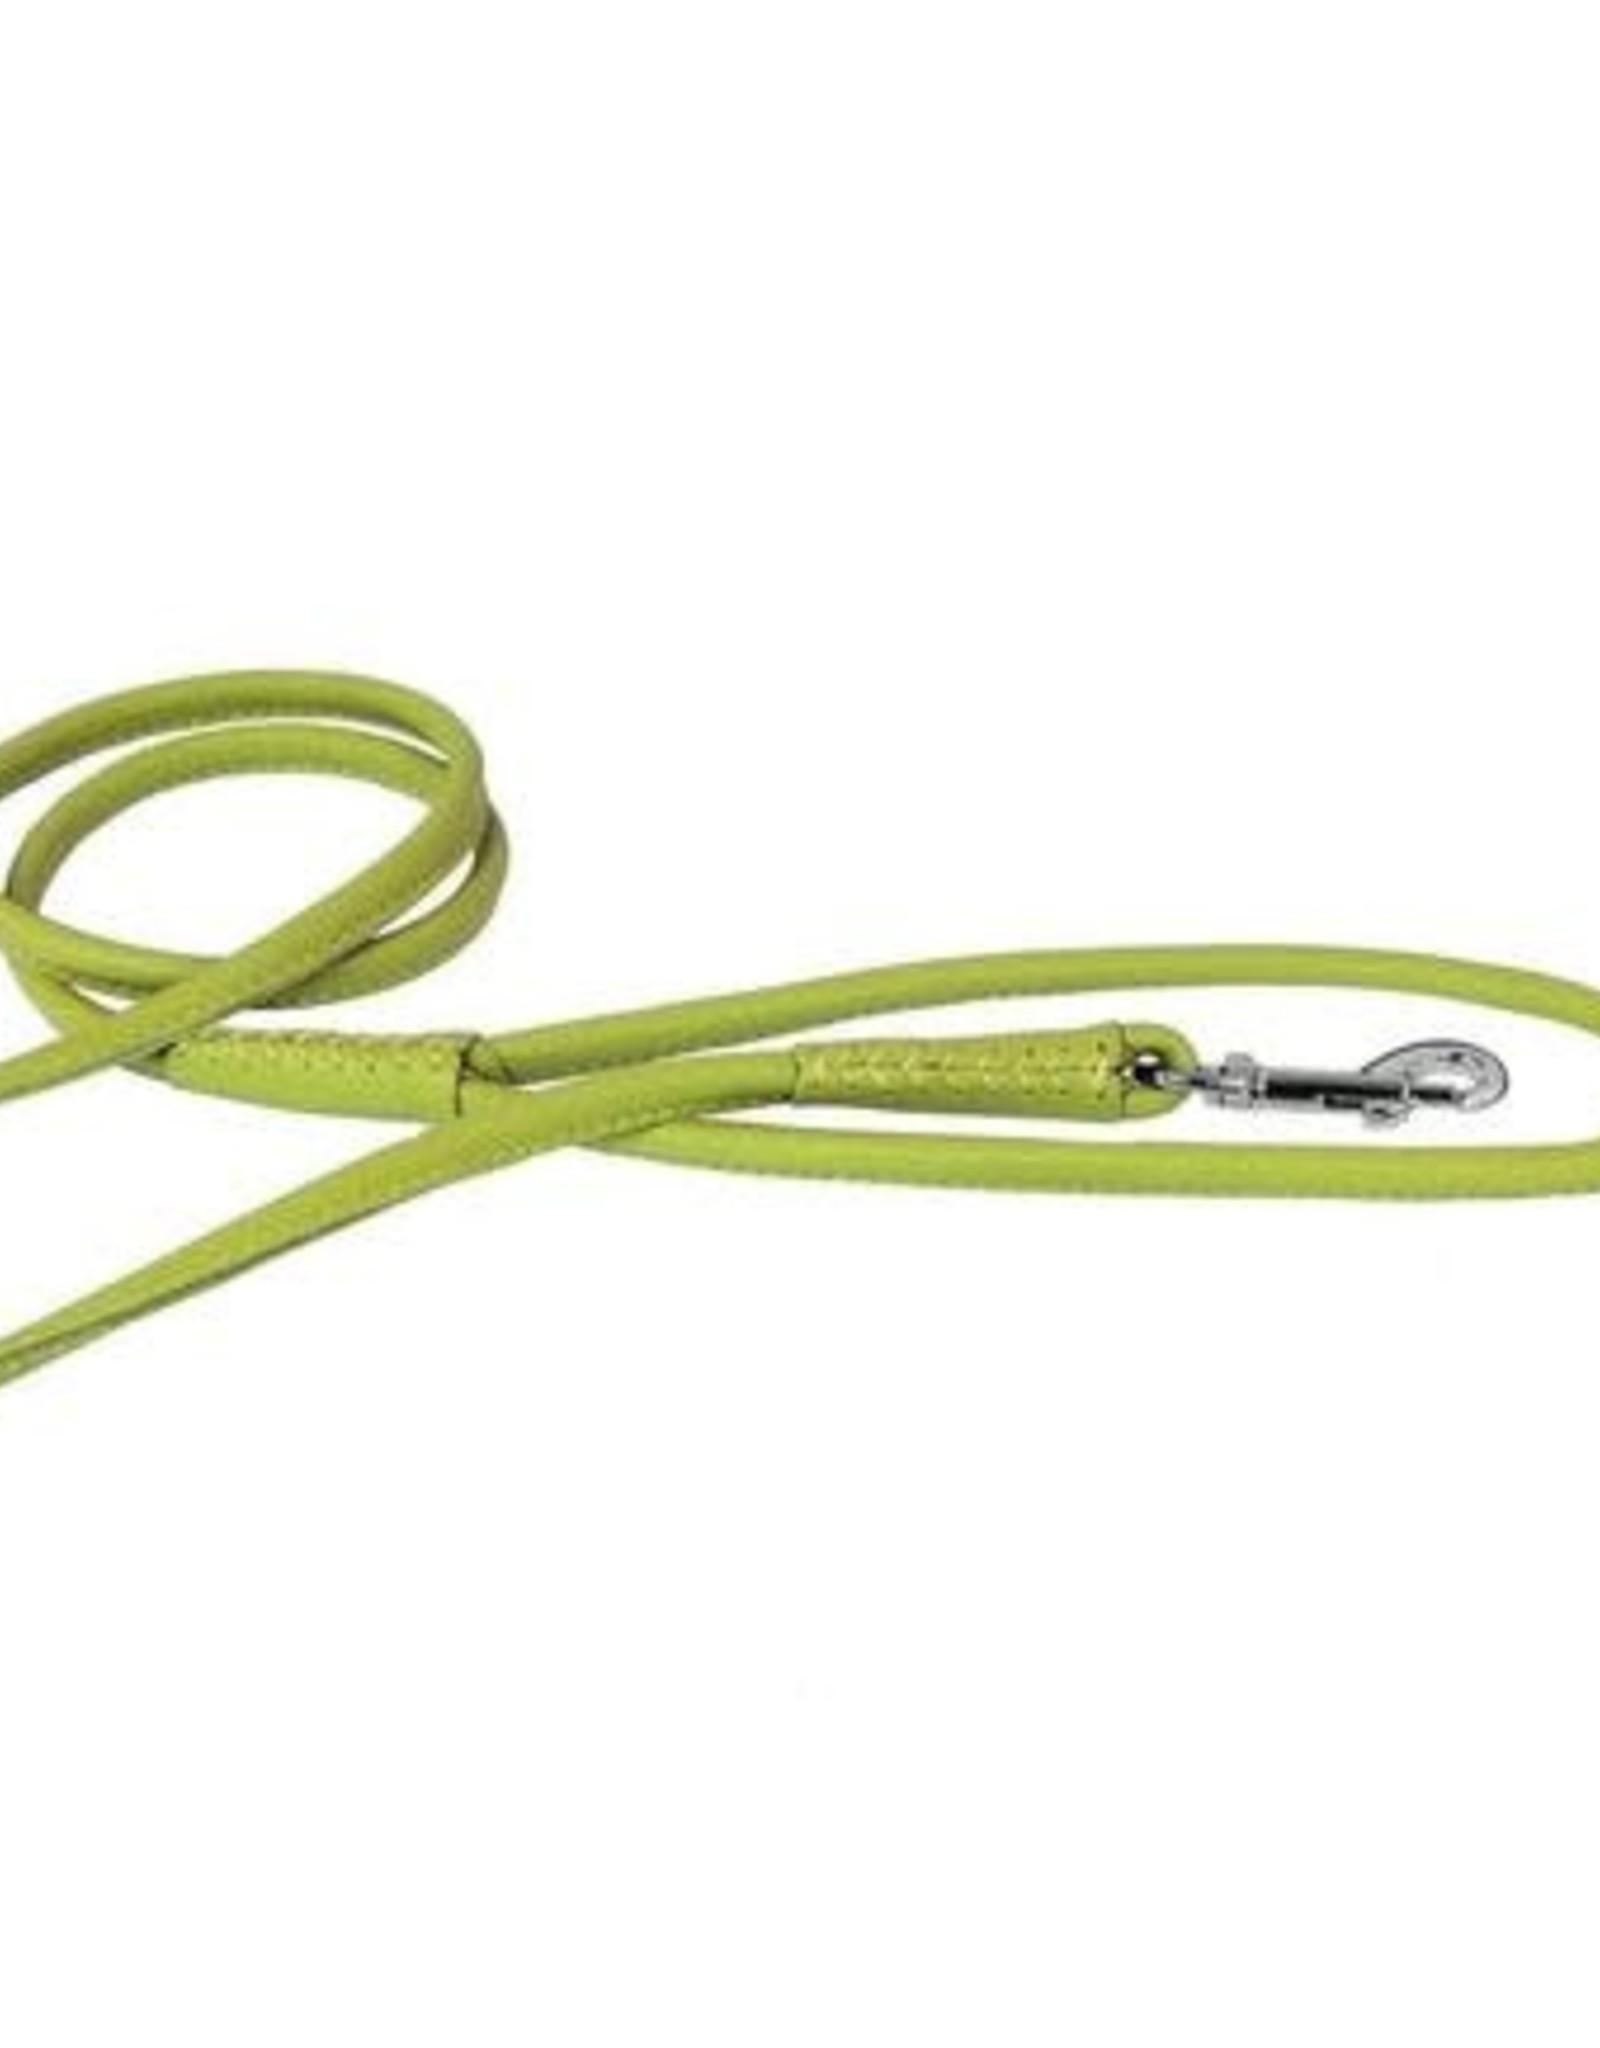 "Dogline Dogline Lime Green 1/2"" Leather Lead"